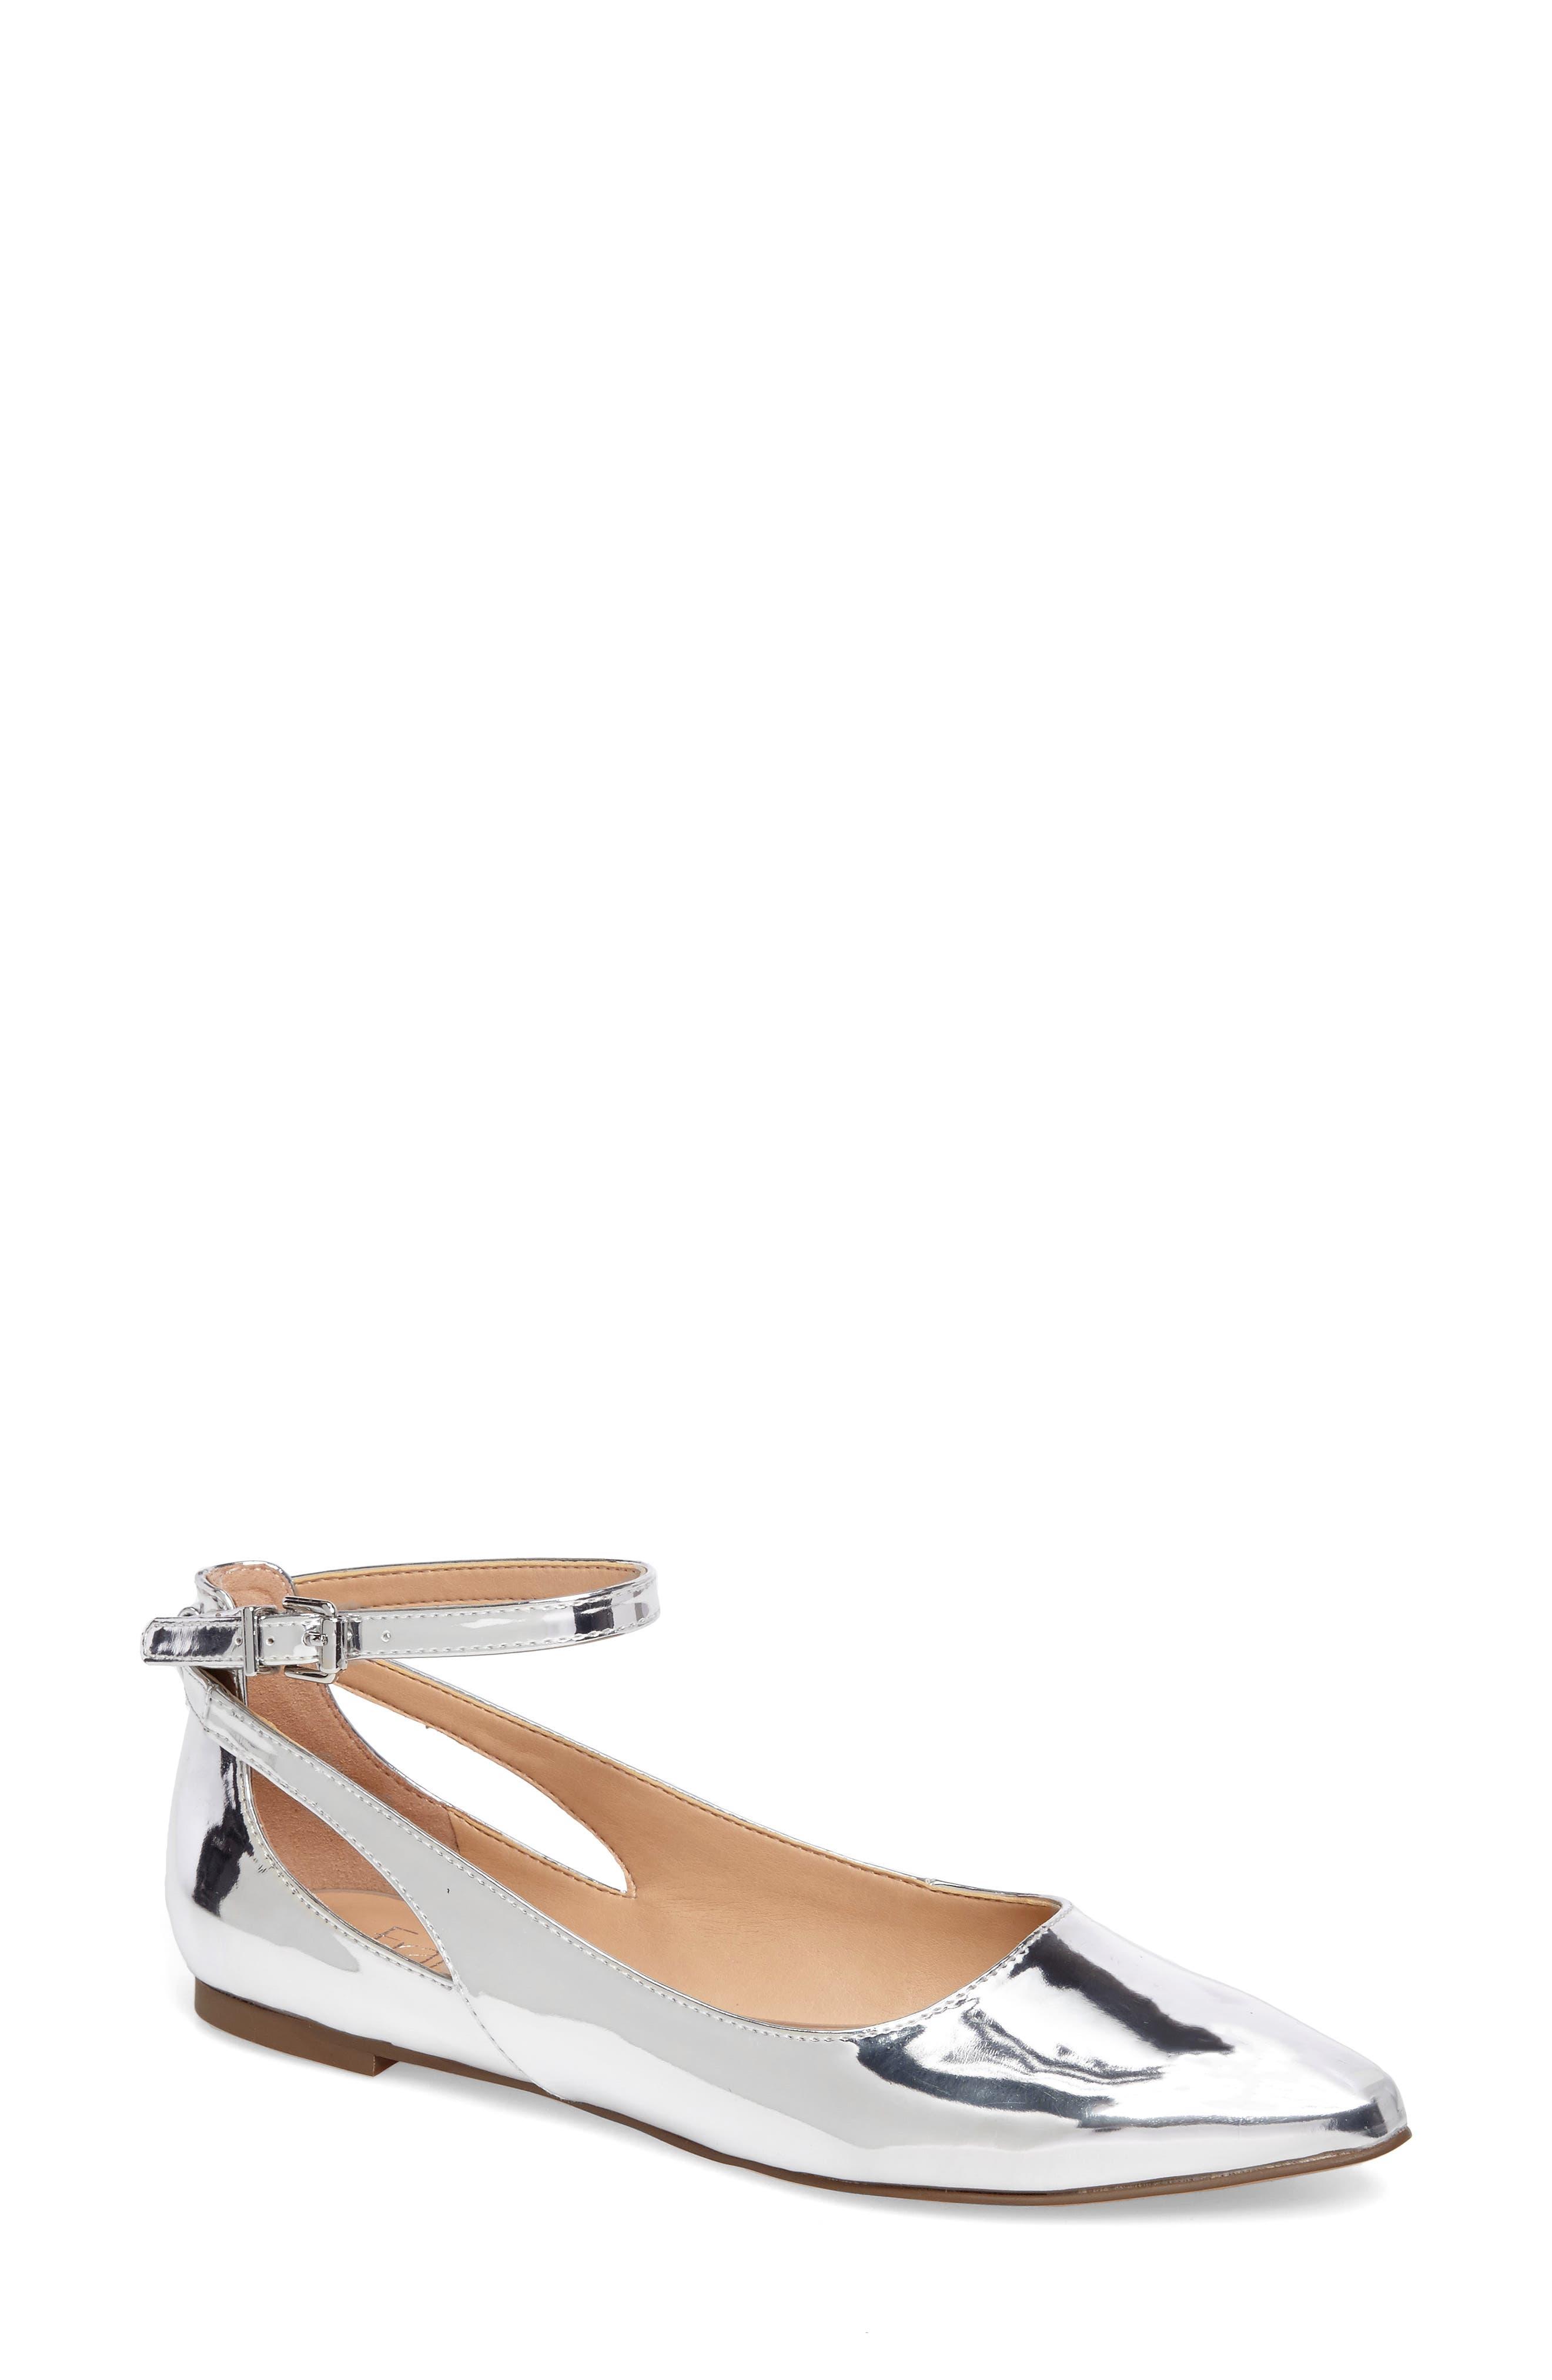 Main Image - SARTO by Franco Sarto Sylvia Ankle Strap Flat (Women)